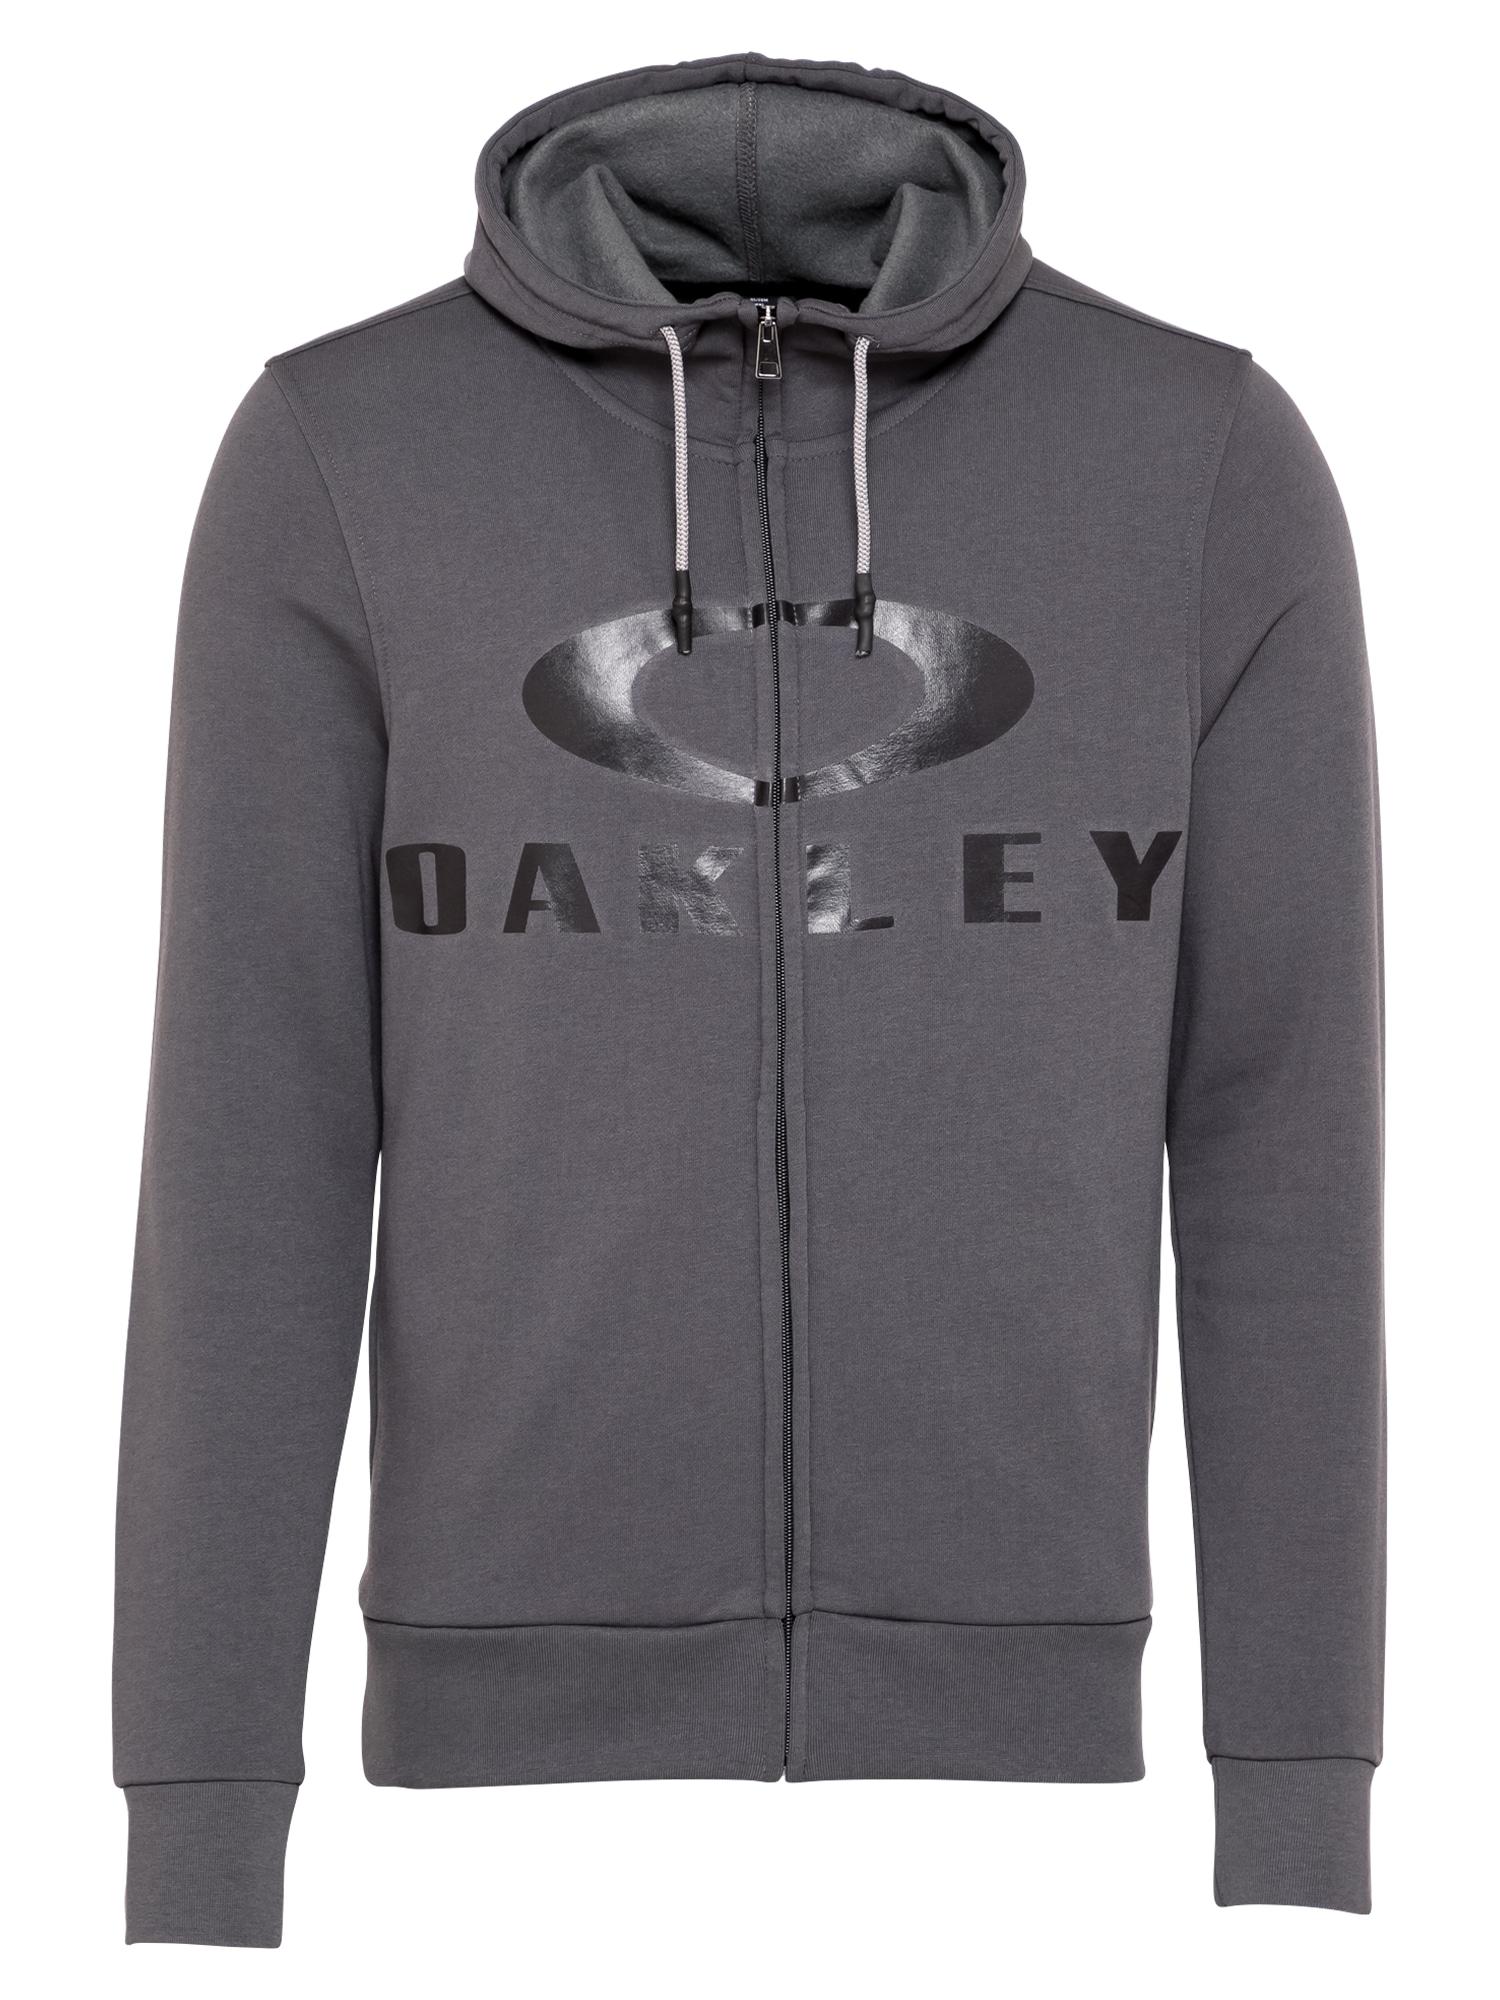 OAKLEY Sportinis džemperis pilka